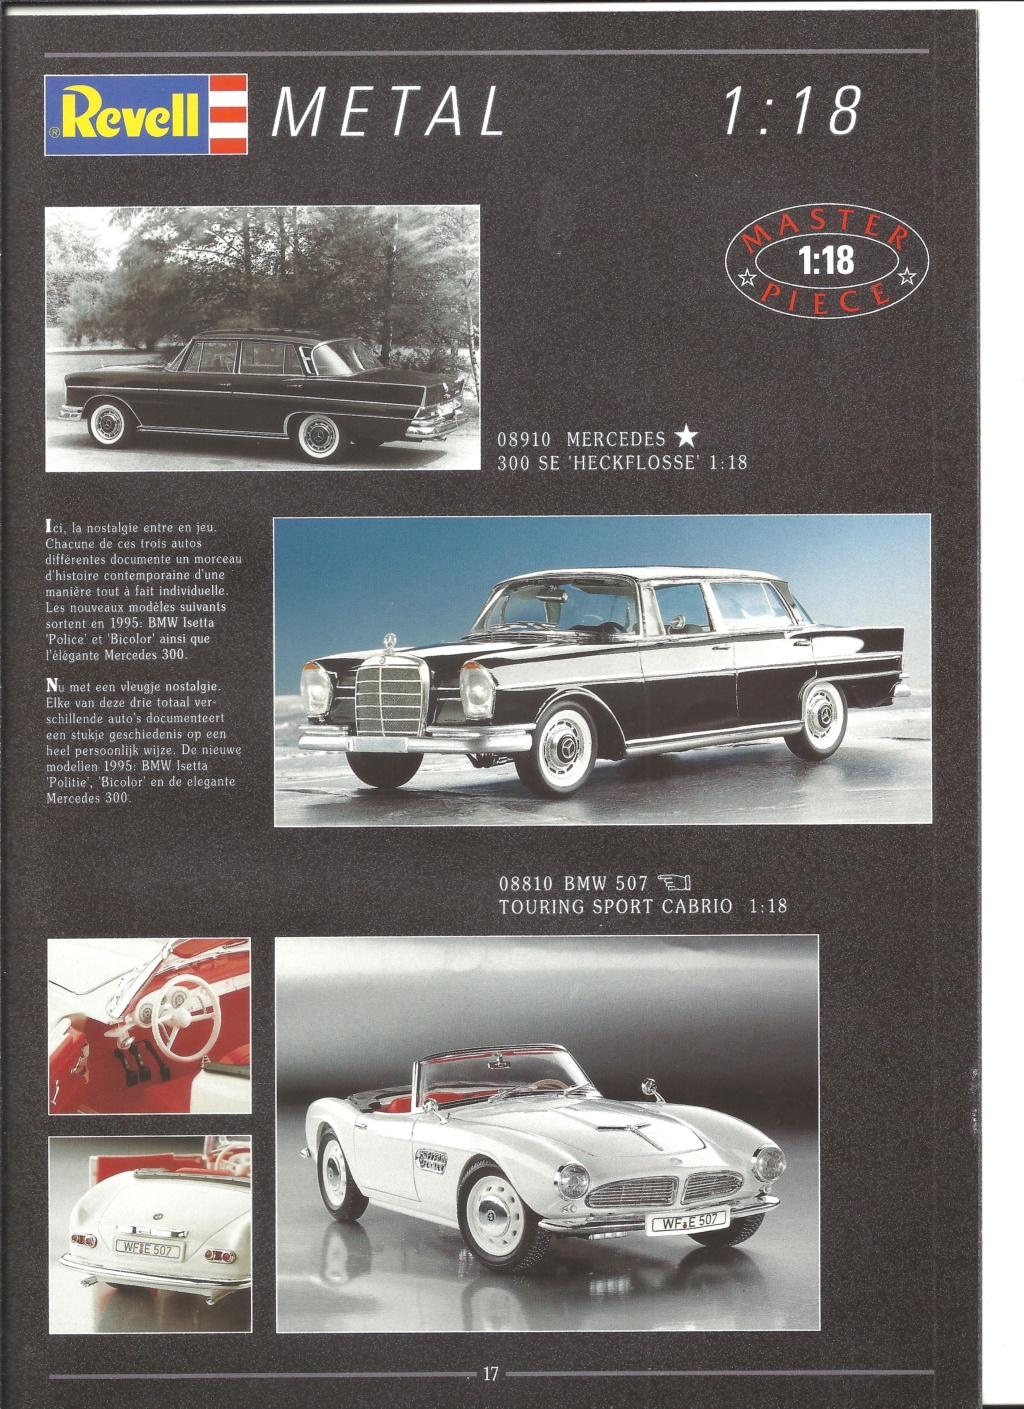 [REVELL 1995] Catalogue METAL miniatures 1995  Revell47